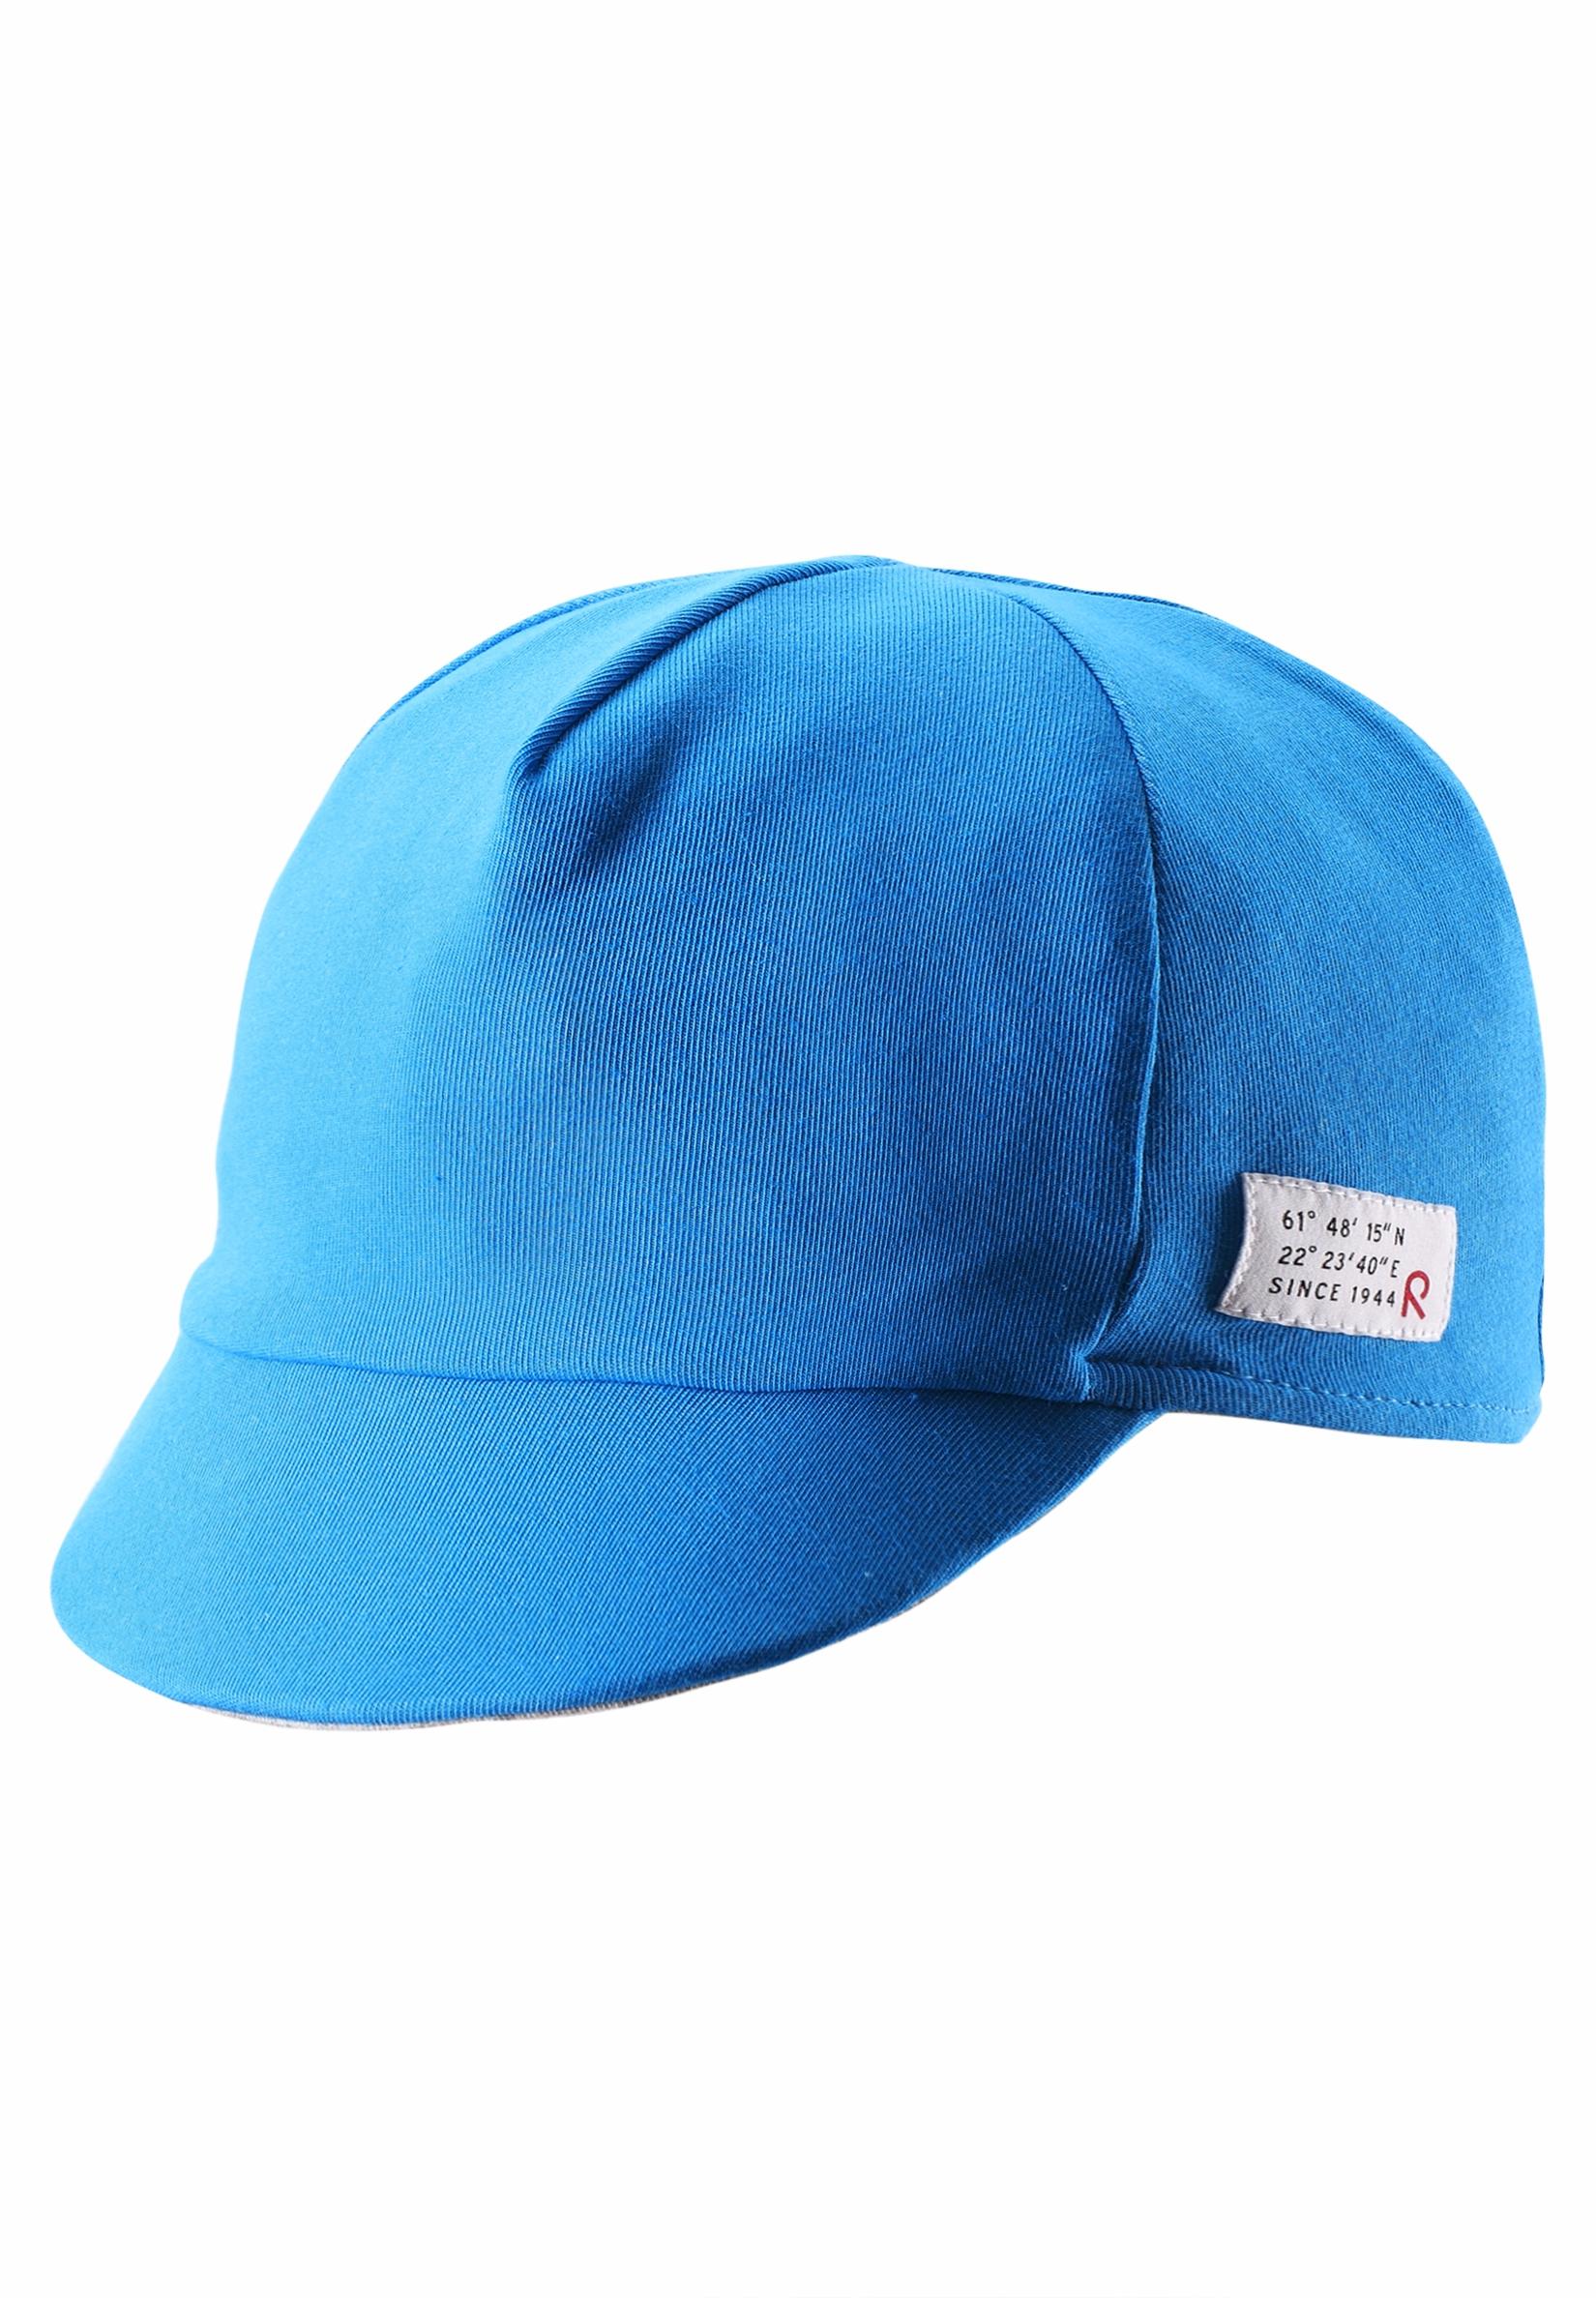 Головные уборы Reima Шапка для мальчика Cap, Wafer ocean blue, голубая childrens play ocean ball pool toy house